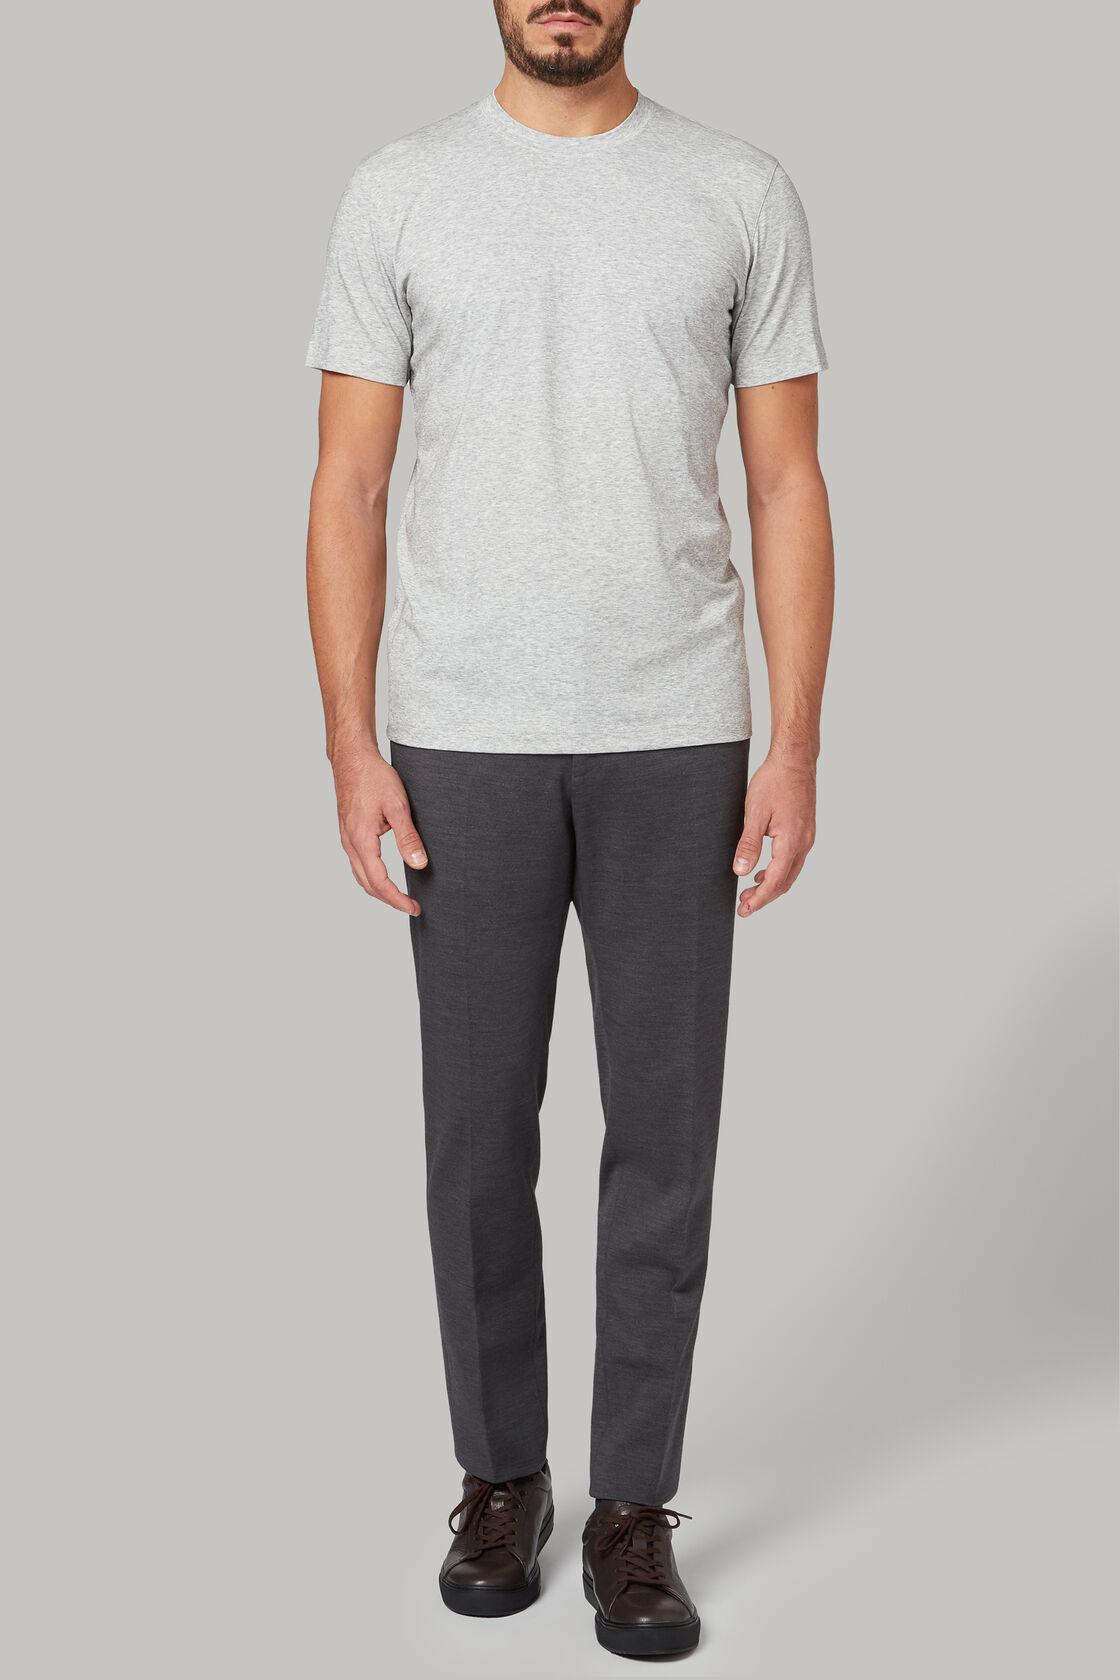 T-shirt aus baumwolljersey und nylon-tencel, Hellgrau, hi-res